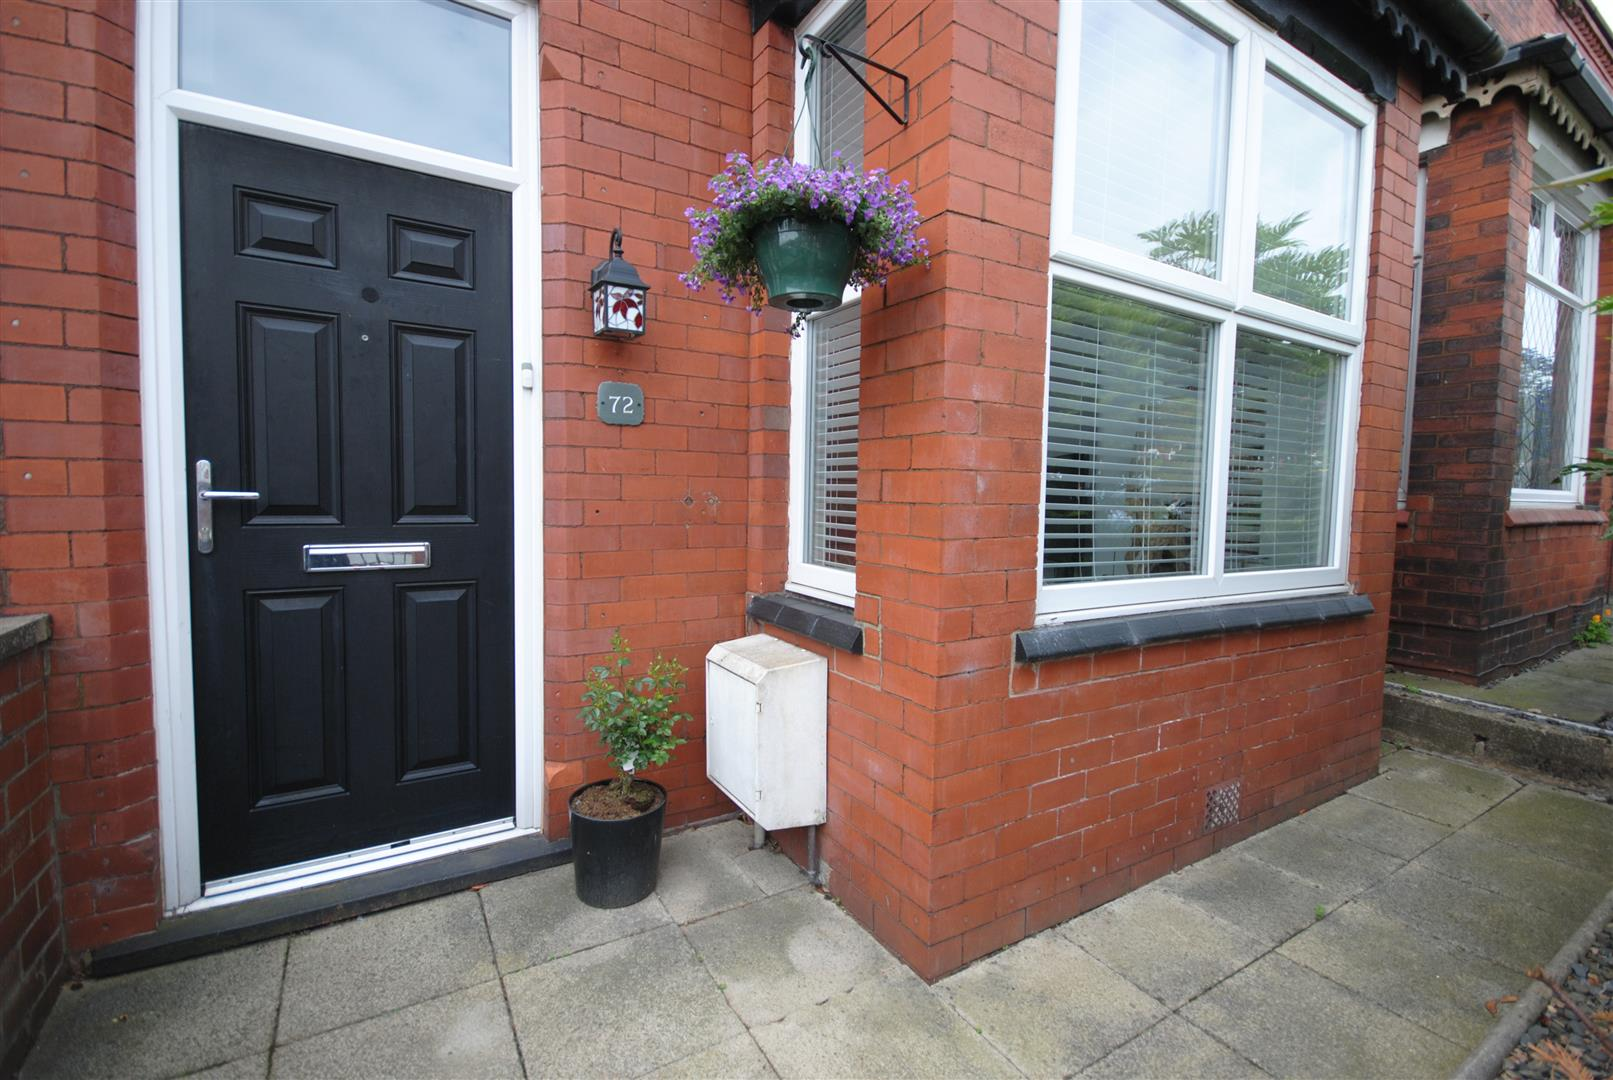 3 Bedrooms Property for sale in Hodges Street, Wigan